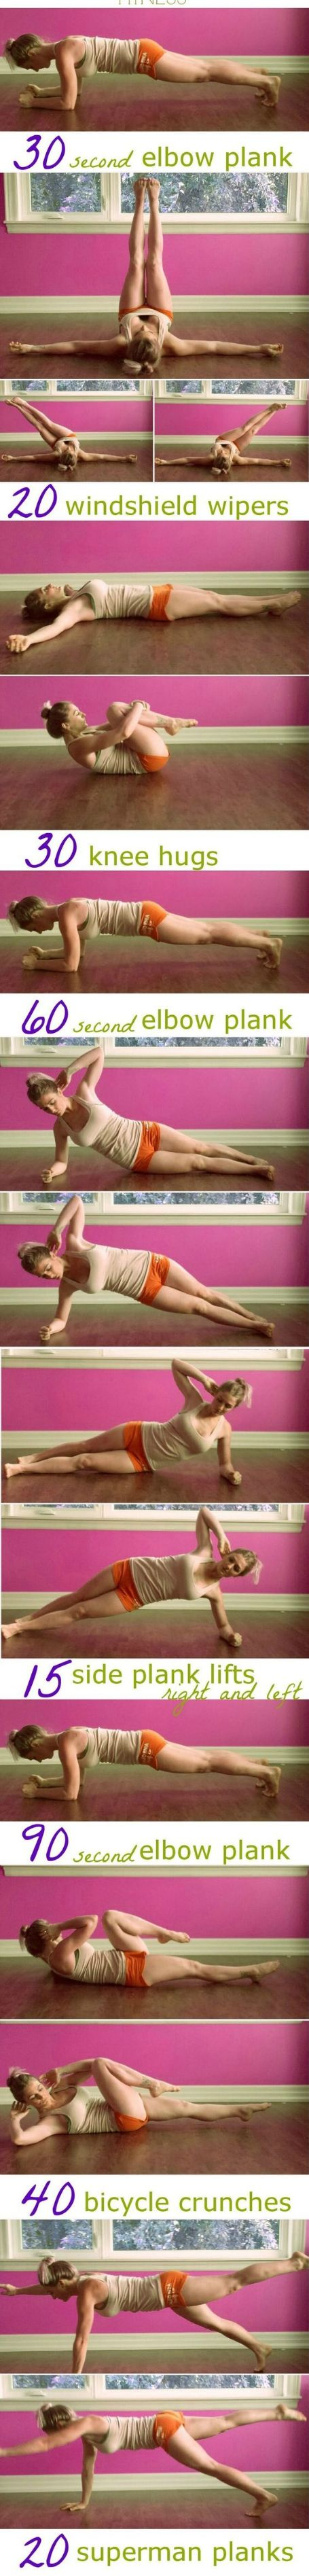 - How to lose inner thigh fat? ... Get rid of inner thigh fat. https://www.youtube.com/watch?v=KHNn1LYzcjg #weightlossmotivation